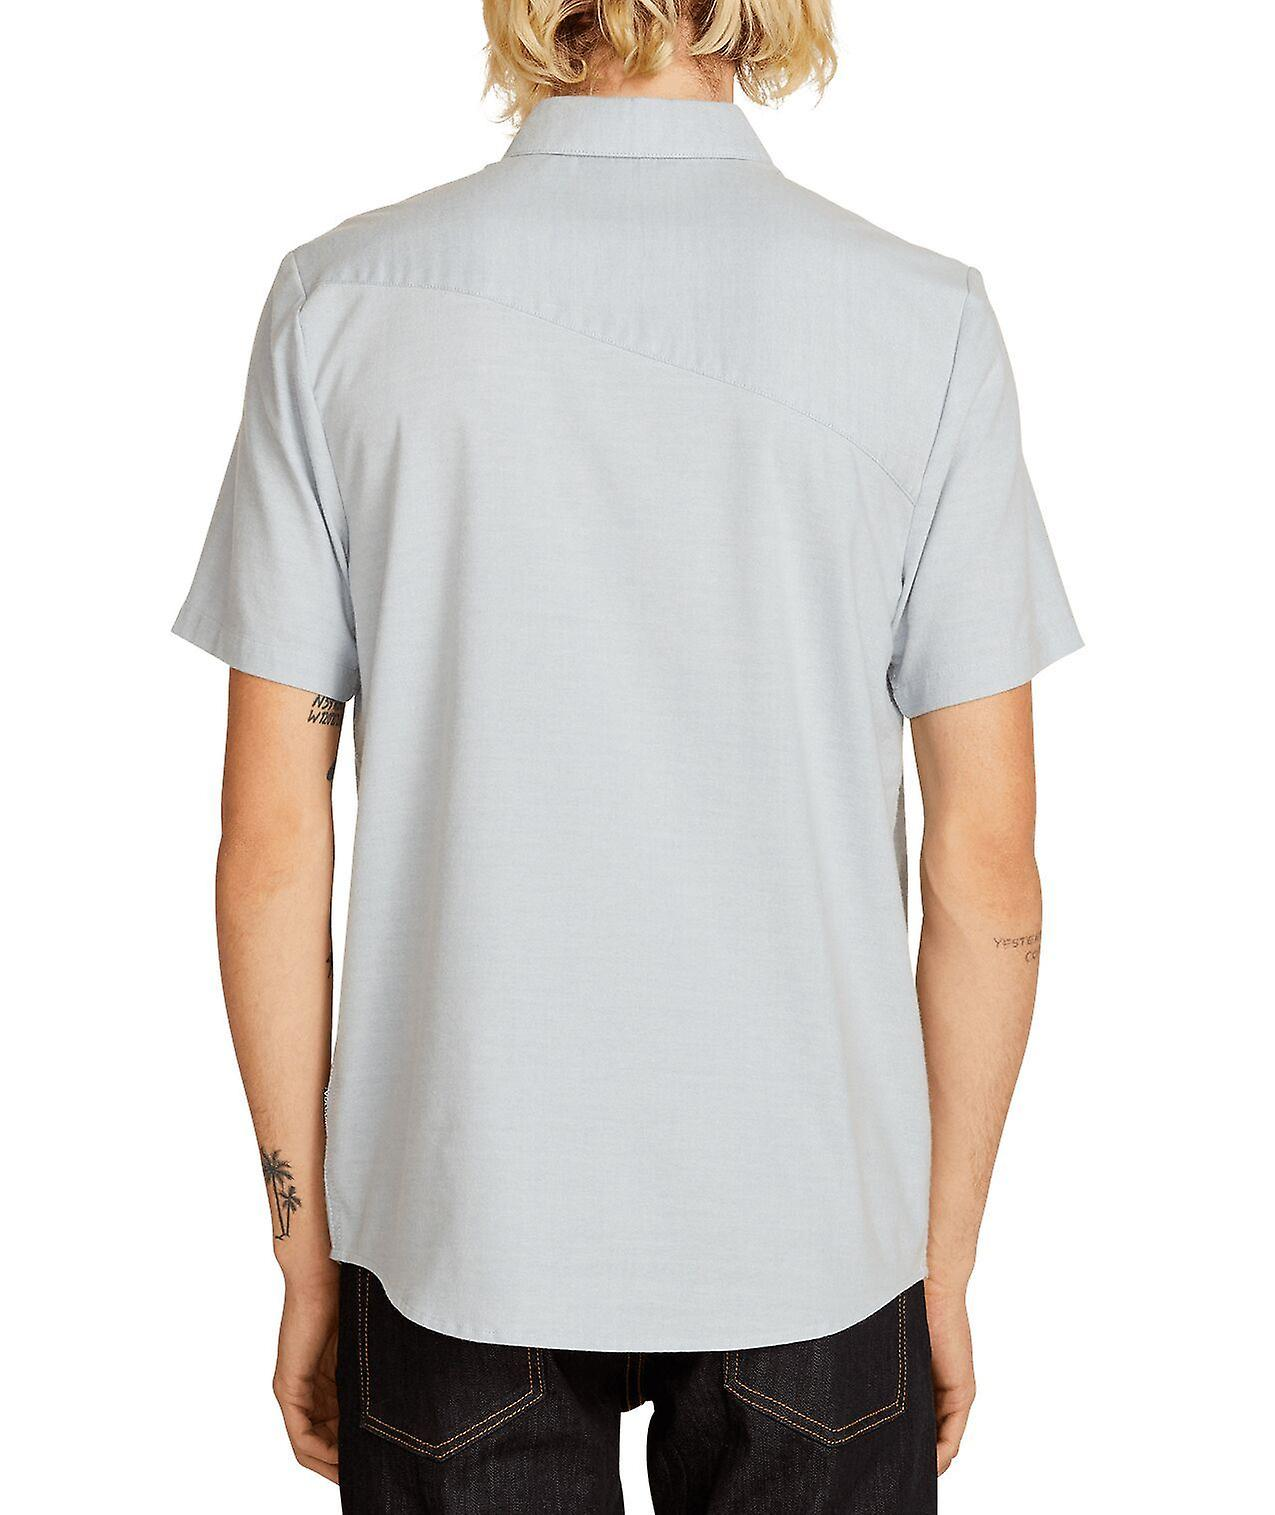 Volcom Men's Shirt ~ Everett Oxford blue